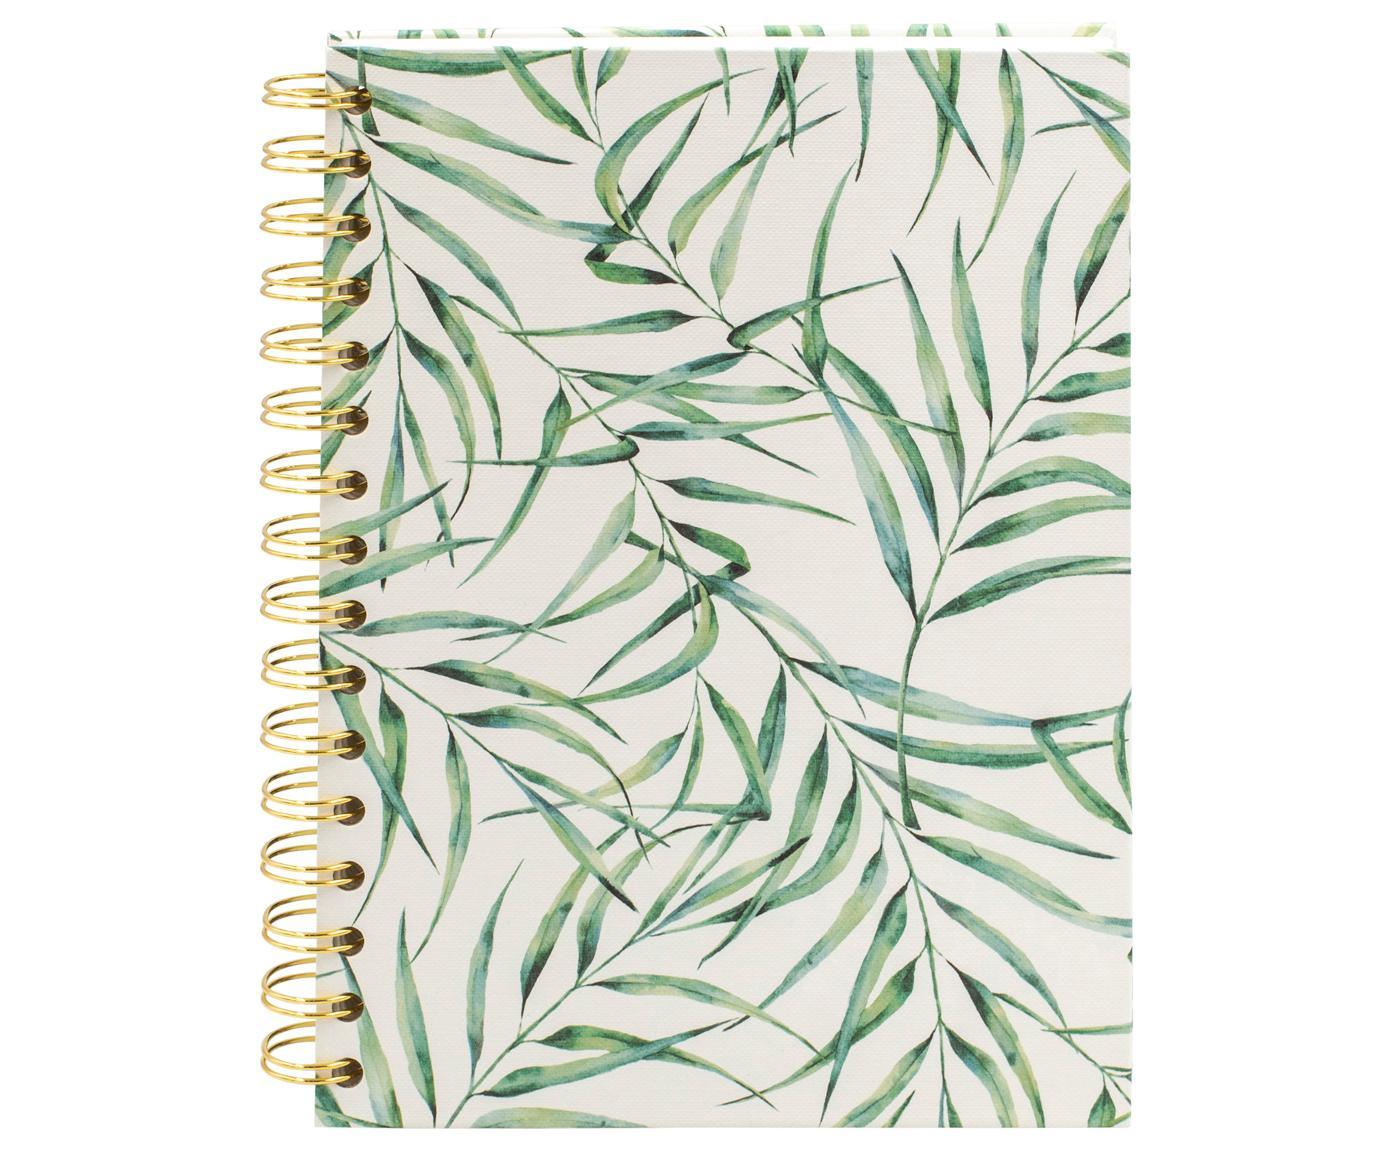 Notitieboek Leaf, Wit, groen, 16 x 21 cm